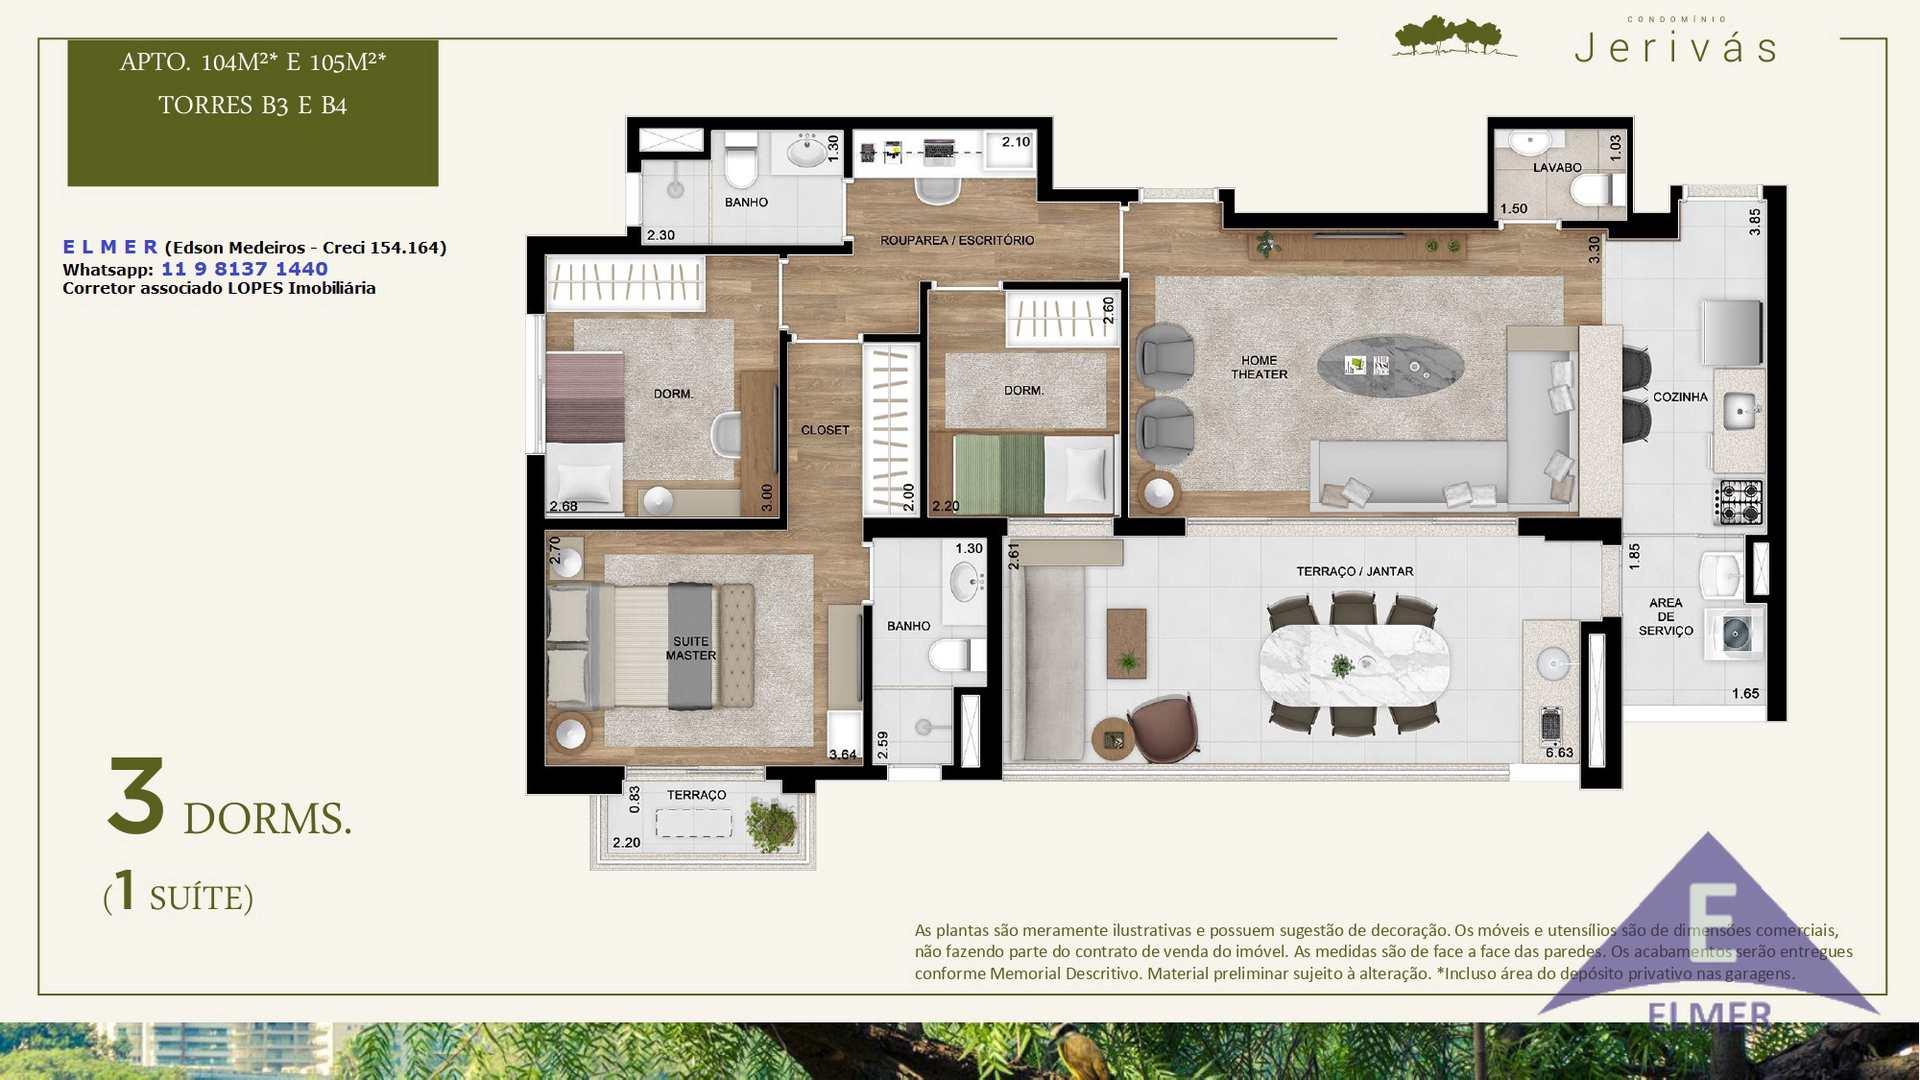 JERIVAS - Planta 104 m² e 105 m² - Torres B3 e B4 - E L M E R